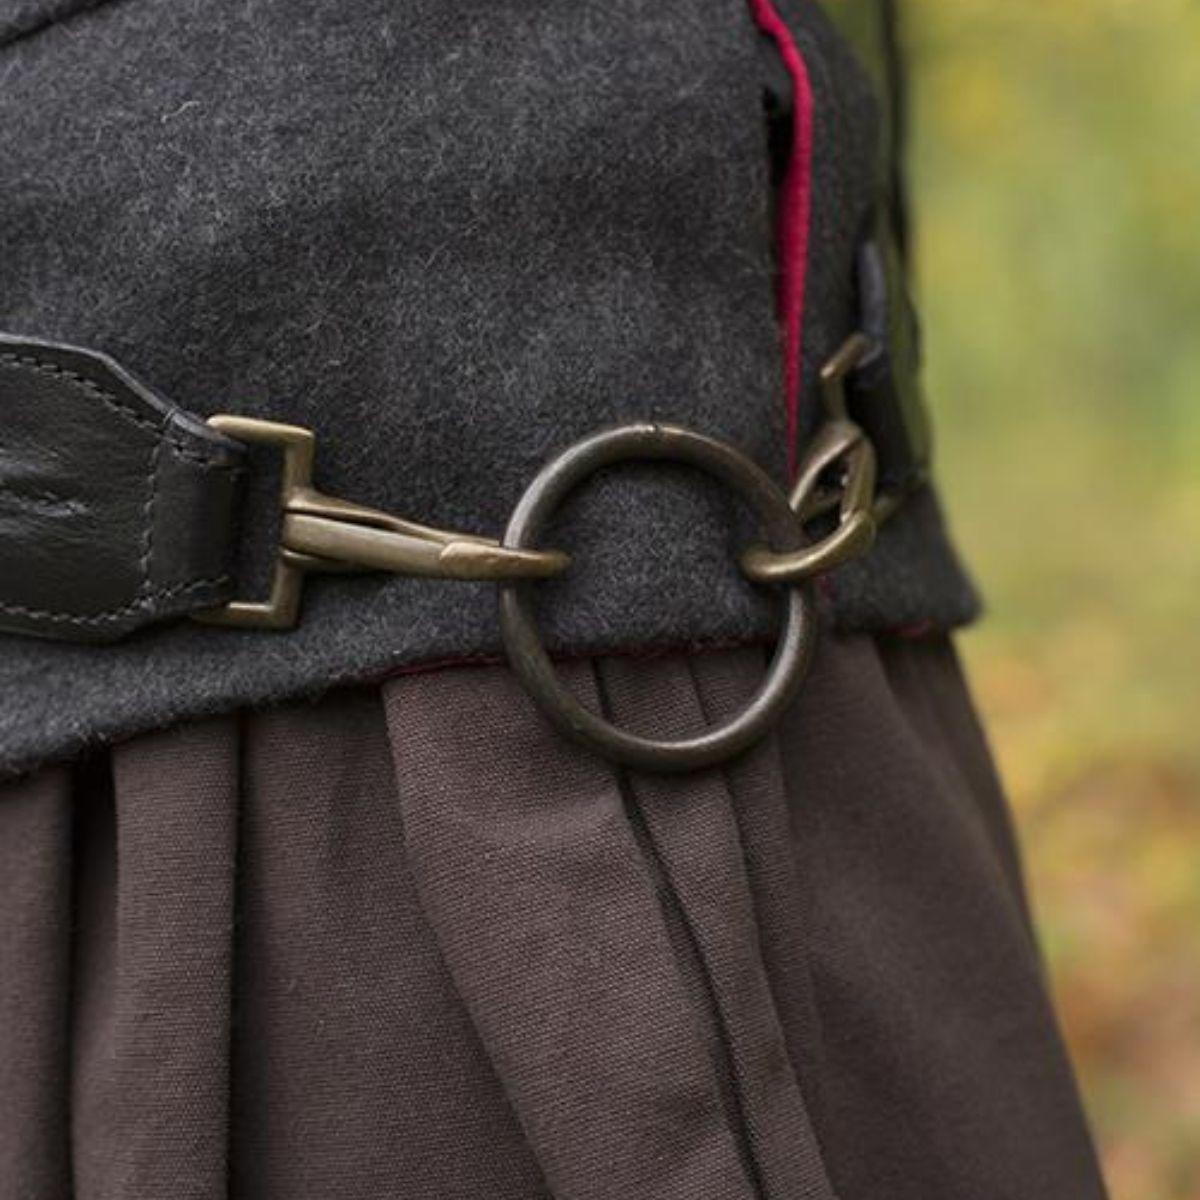 Braided sword belt, black